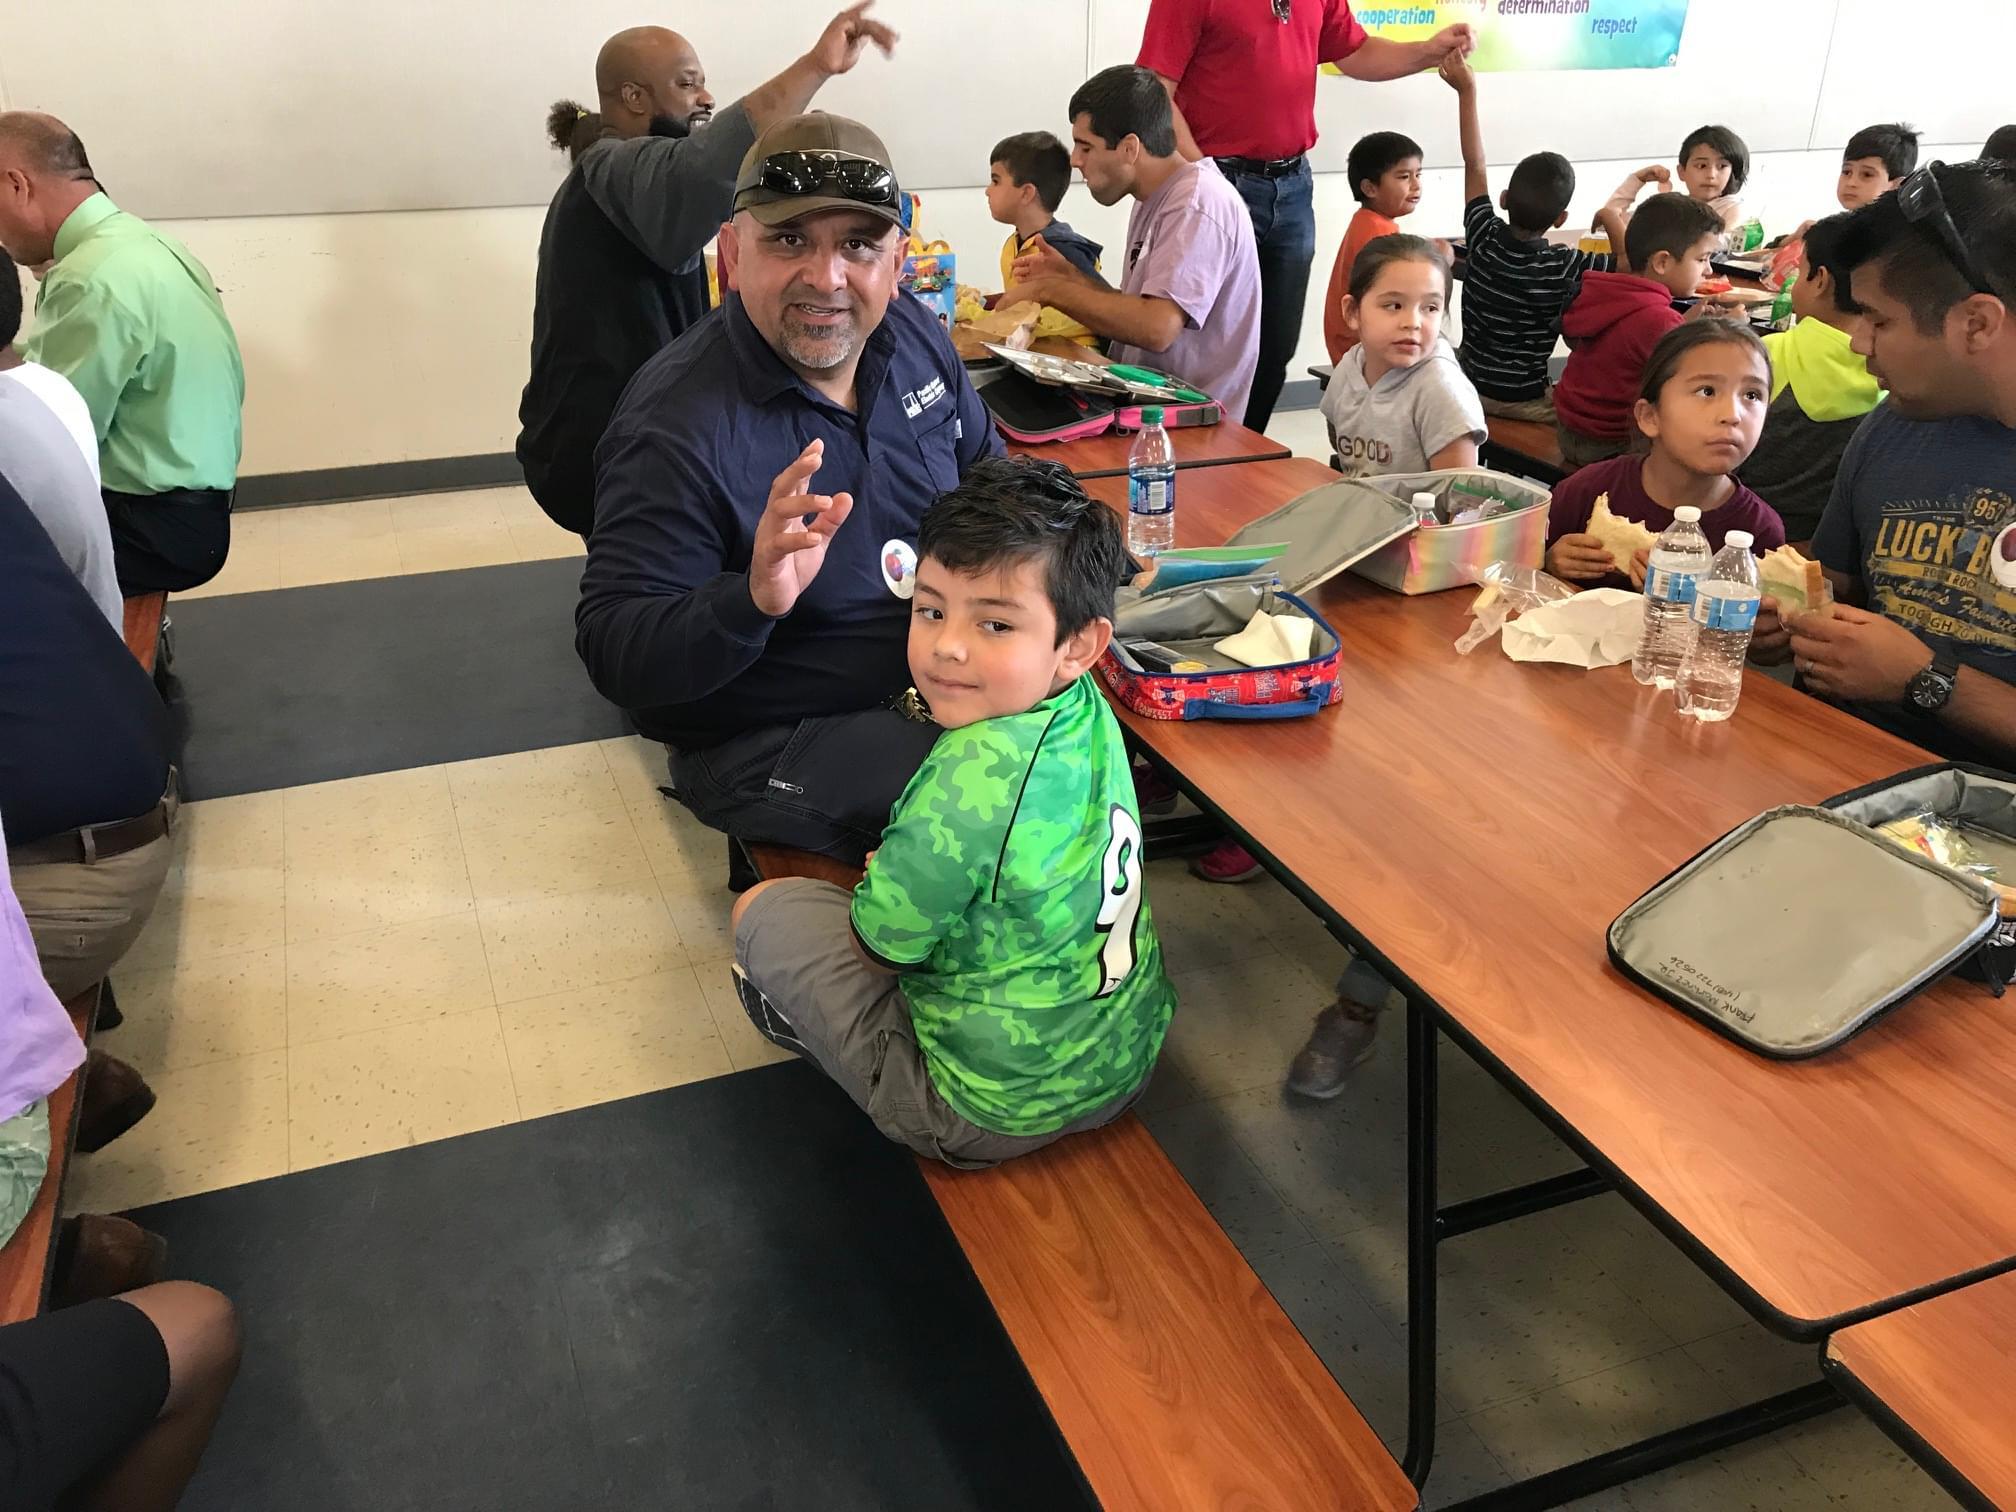 Merced Parent Pays Off Entire School's Lunch Debt